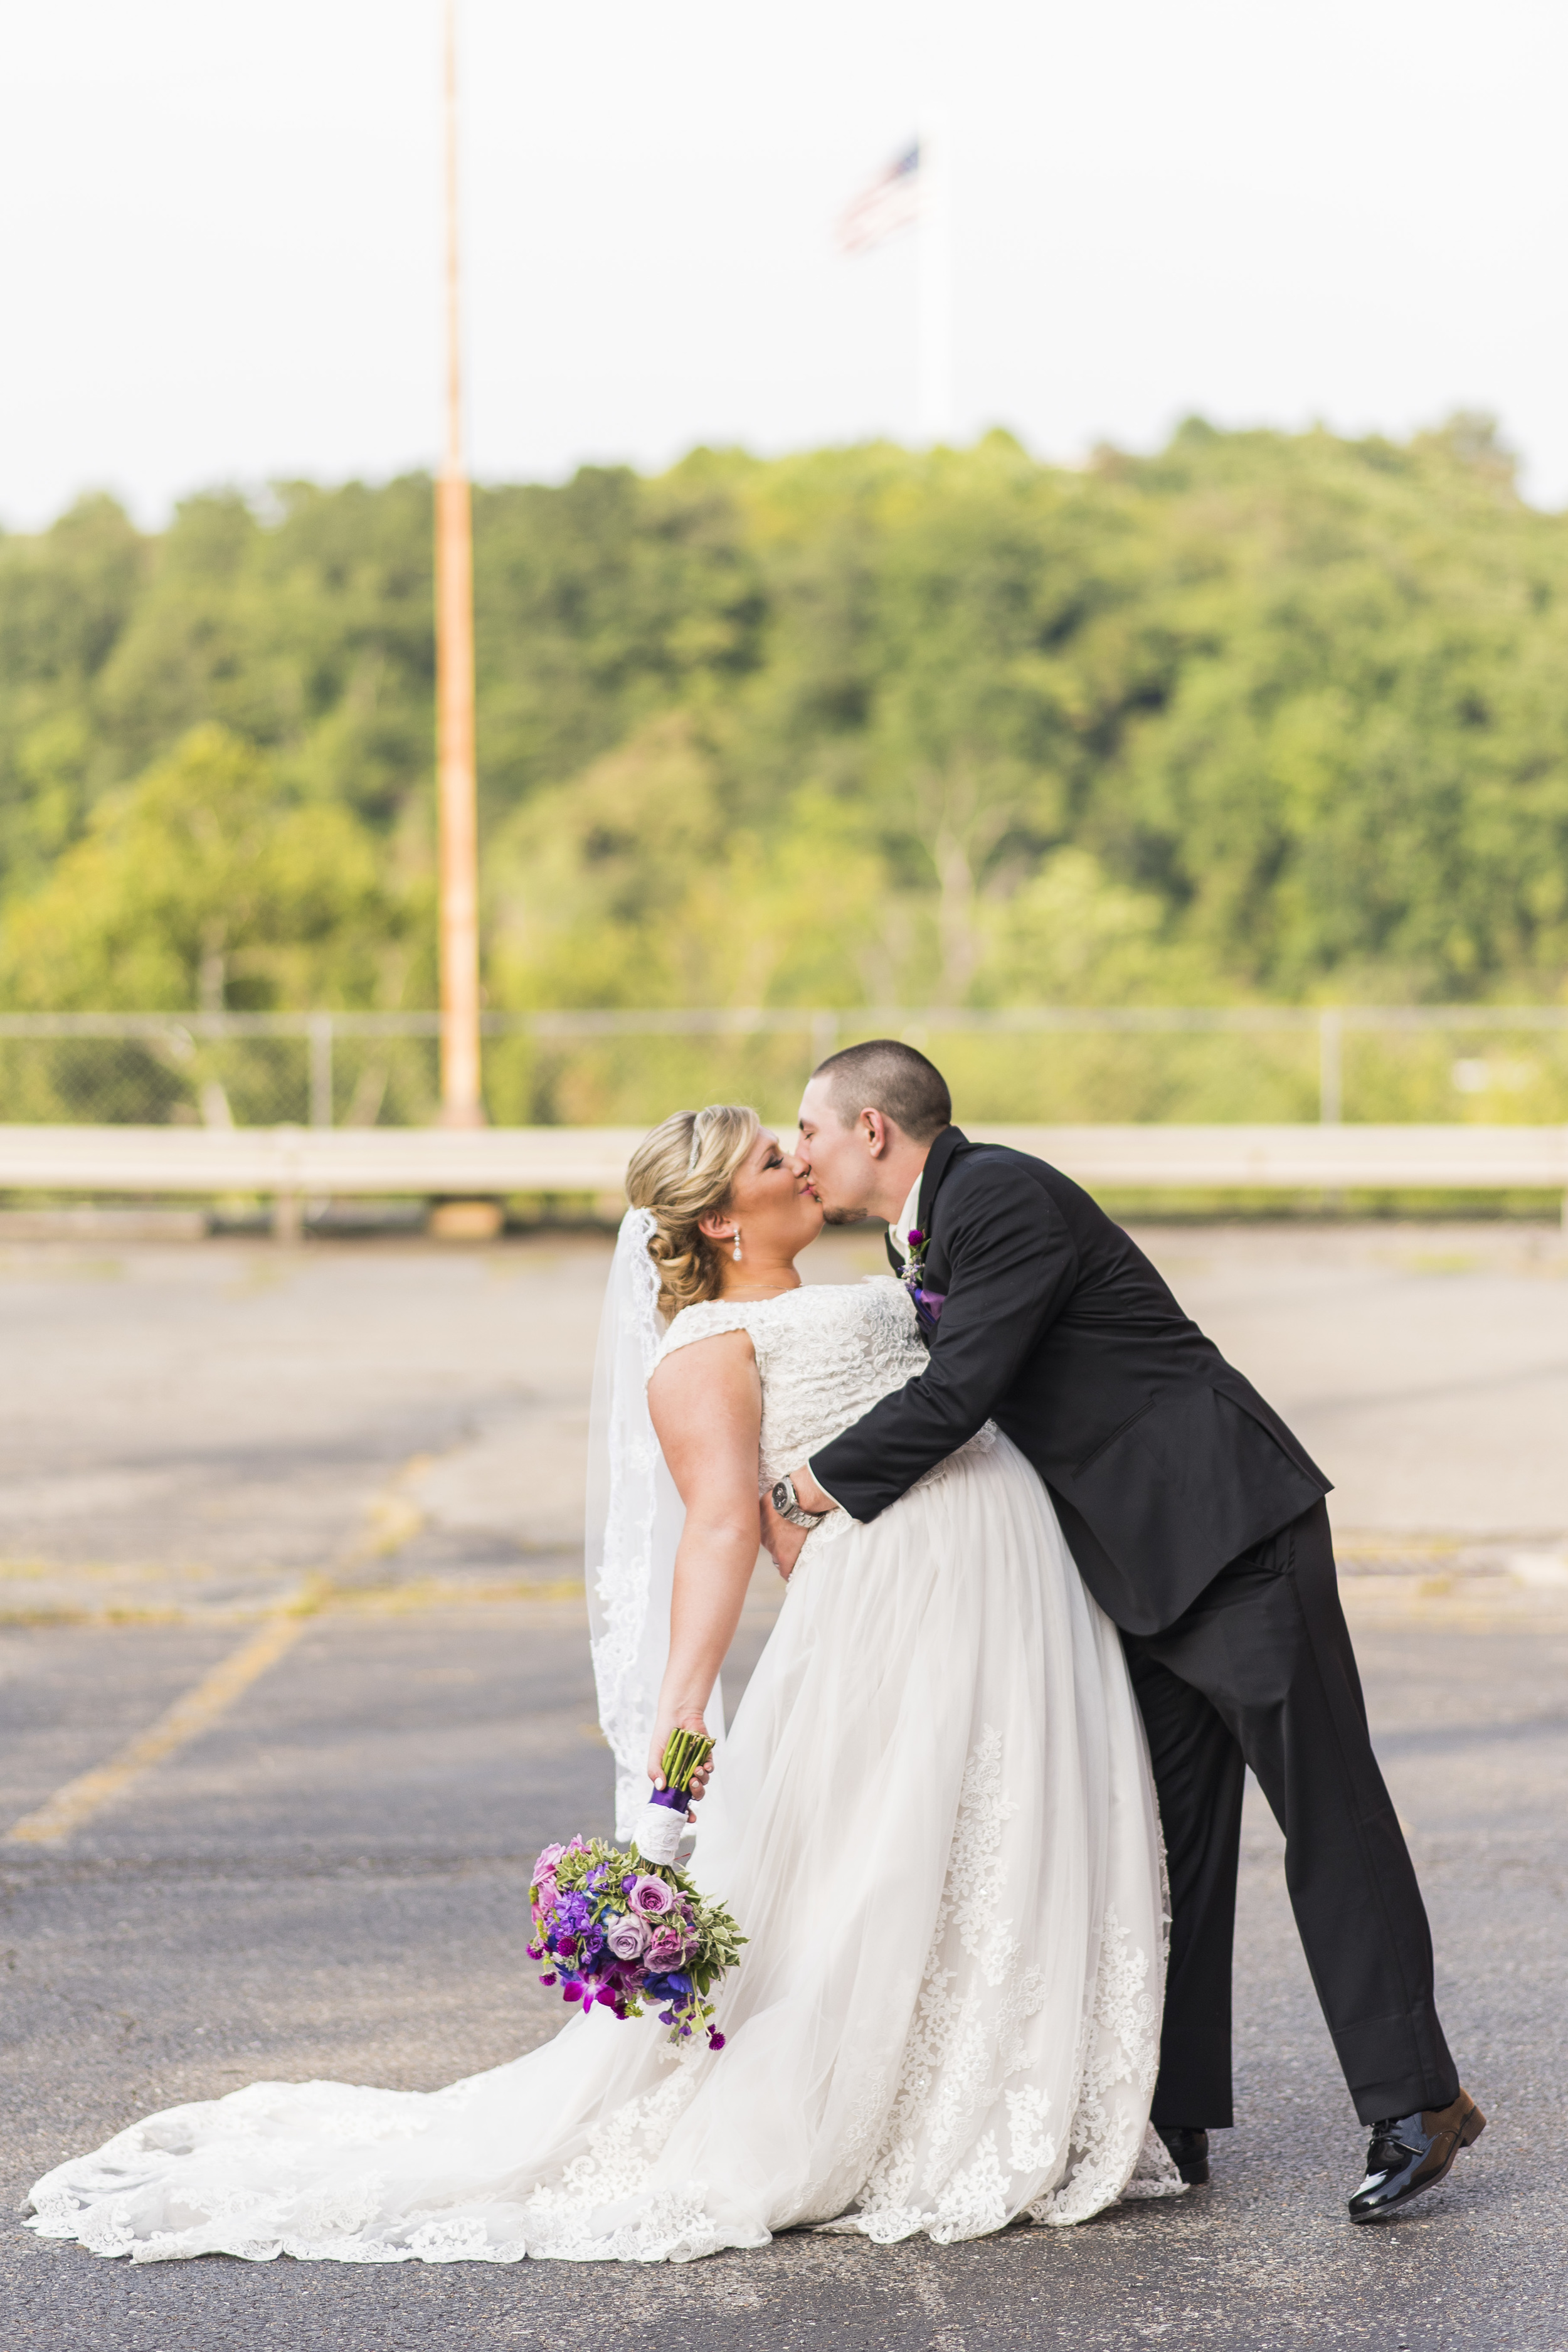 Lynchburg_VA_Wedding_Tresca on 8th_Downtown_Purple_elegant_Photos896.jpg